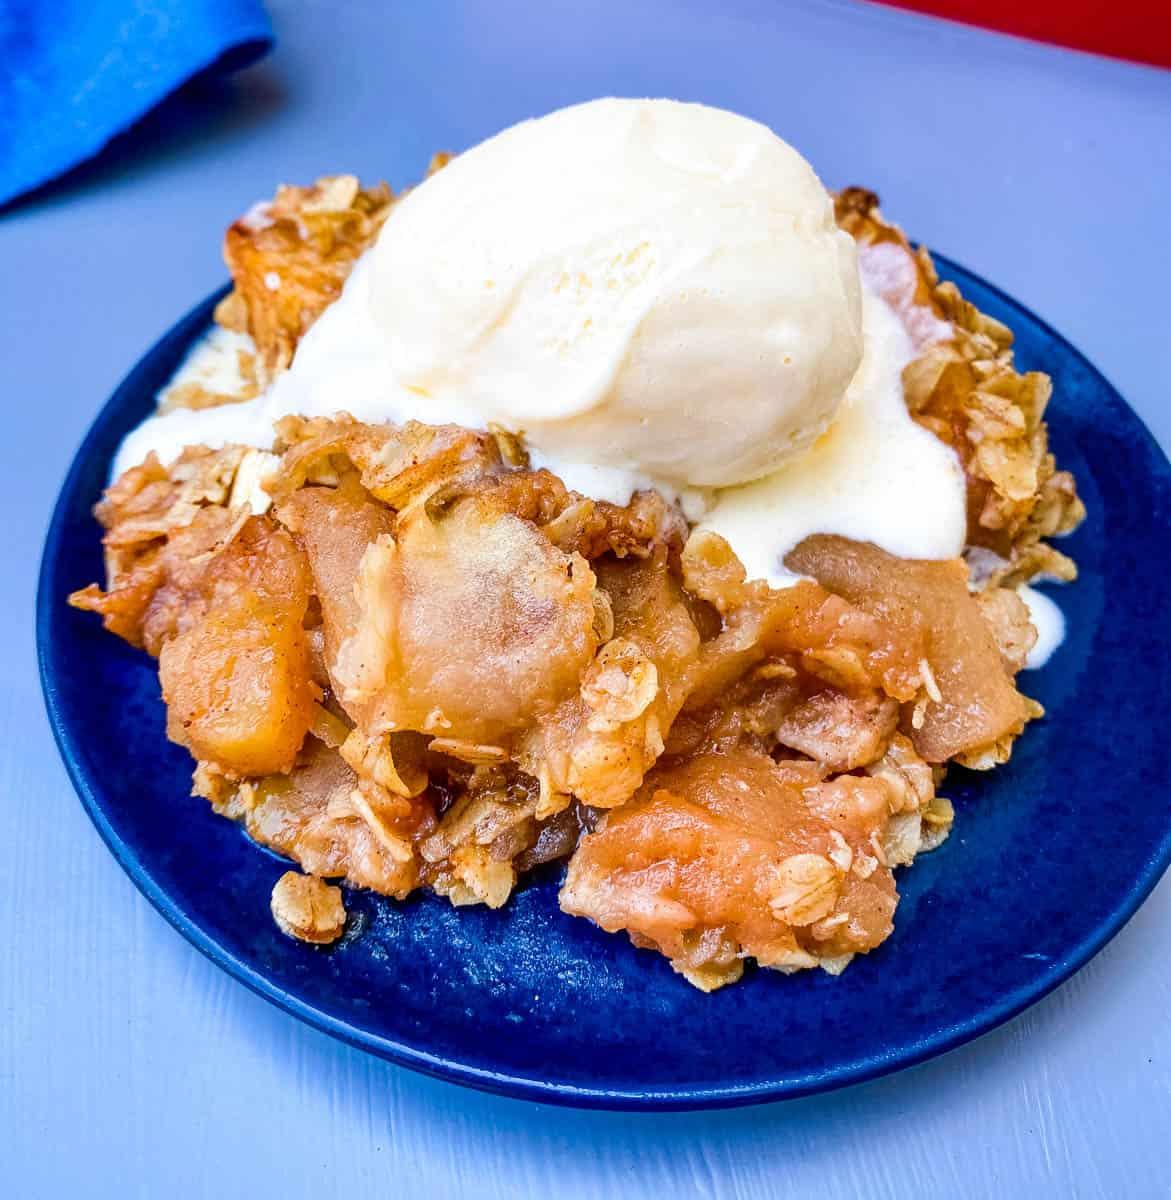 healthy apple crisp on a blue plate with vanilla ice cream